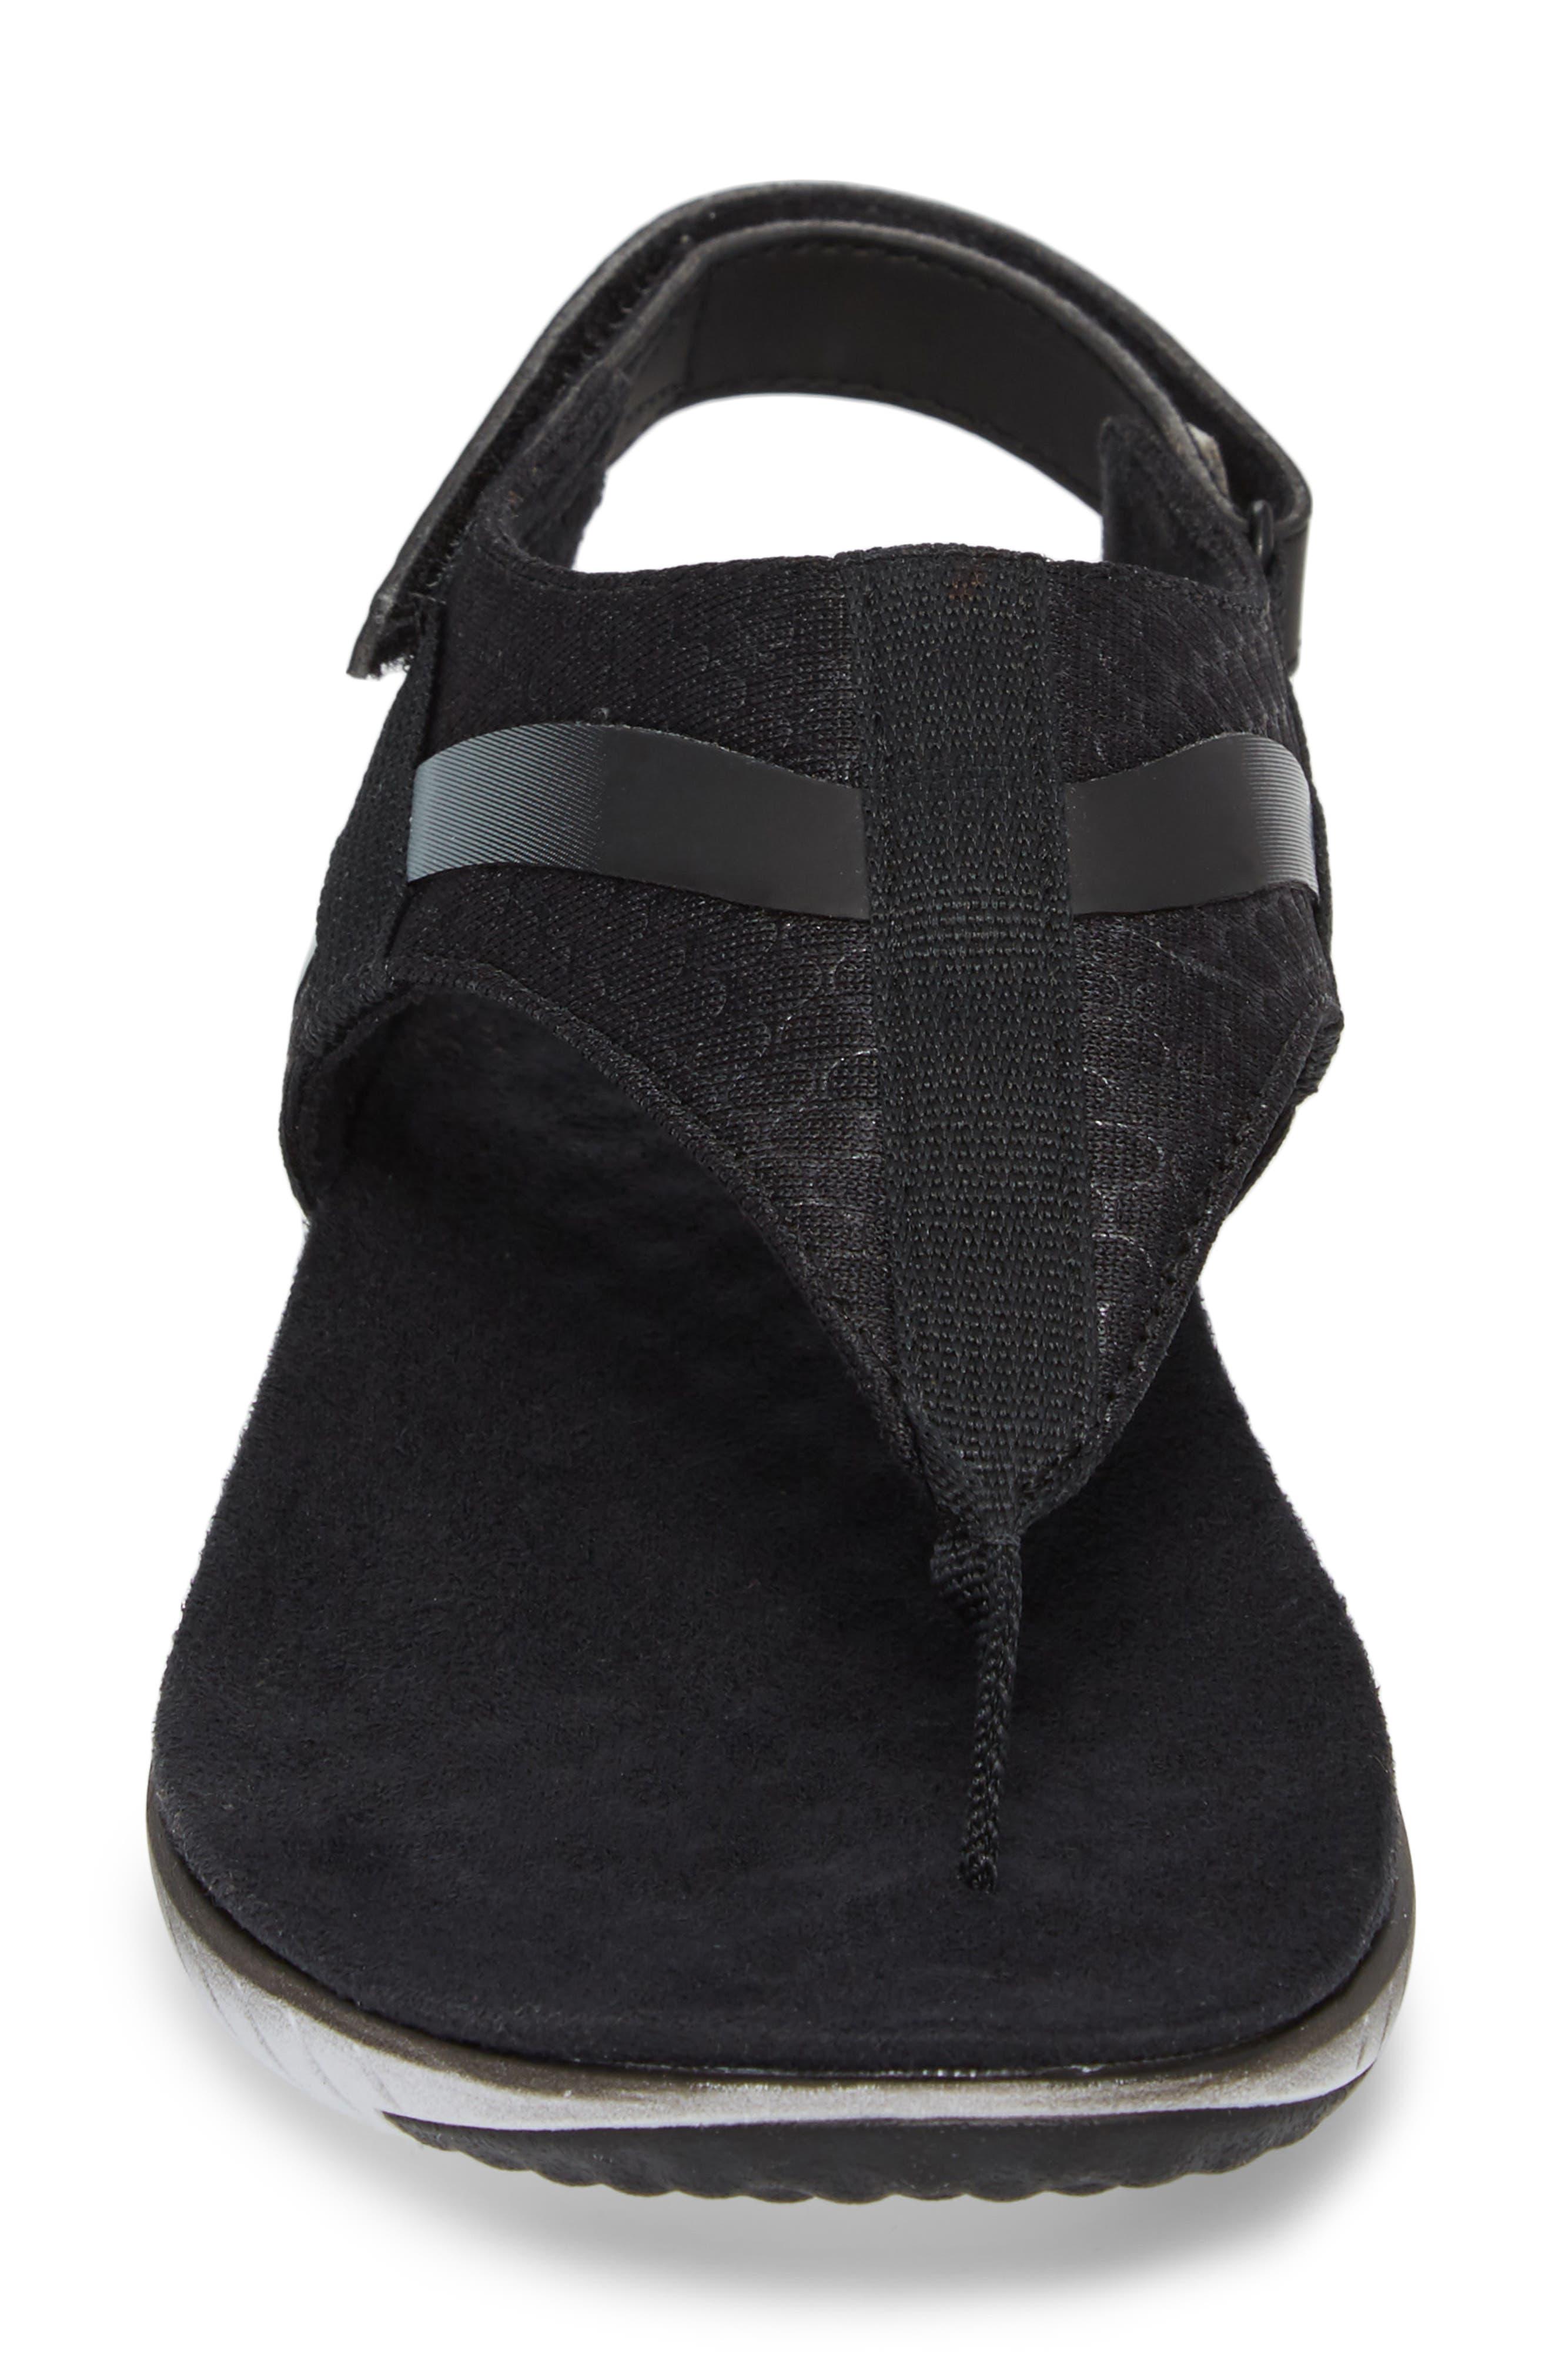 1SIX8 Linna Slide Air Cushion+ Sandal,                             Alternate thumbnail 4, color,                             001